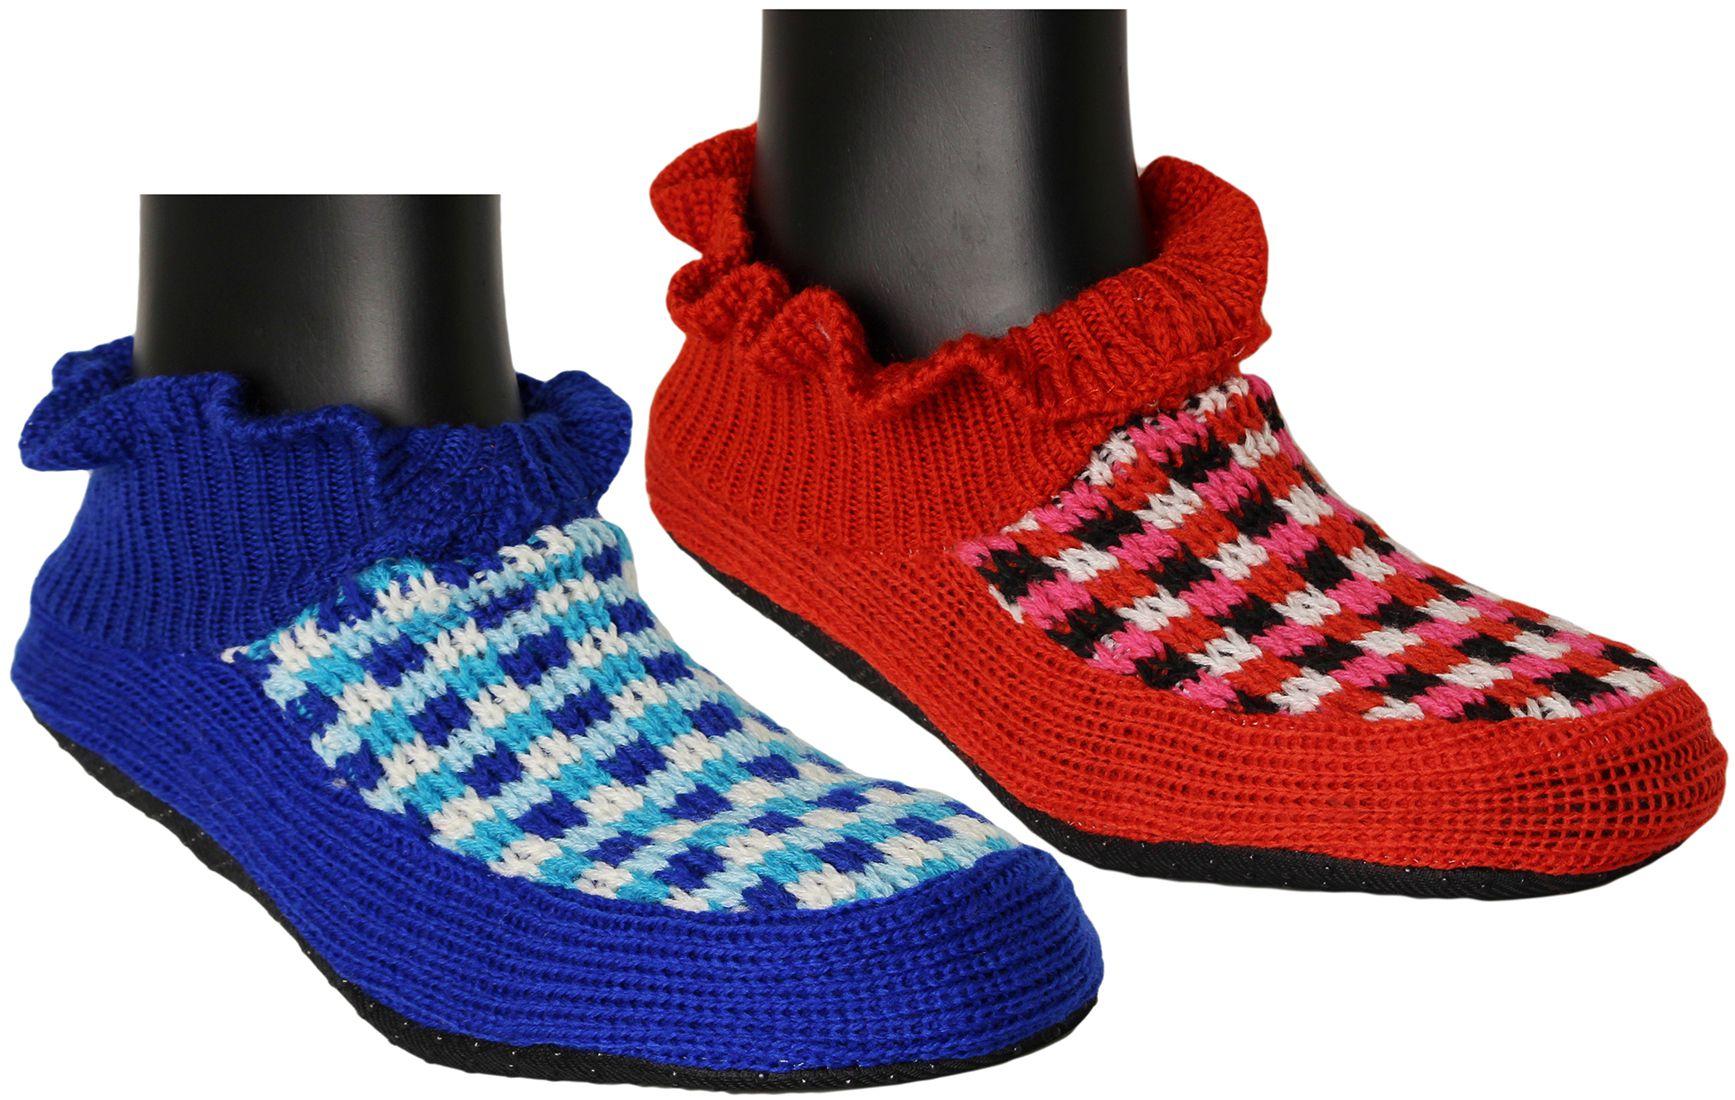 Neska Moda Premium Soft Cotton Women's  Red and Blue Booties Cum Indoor Slippers